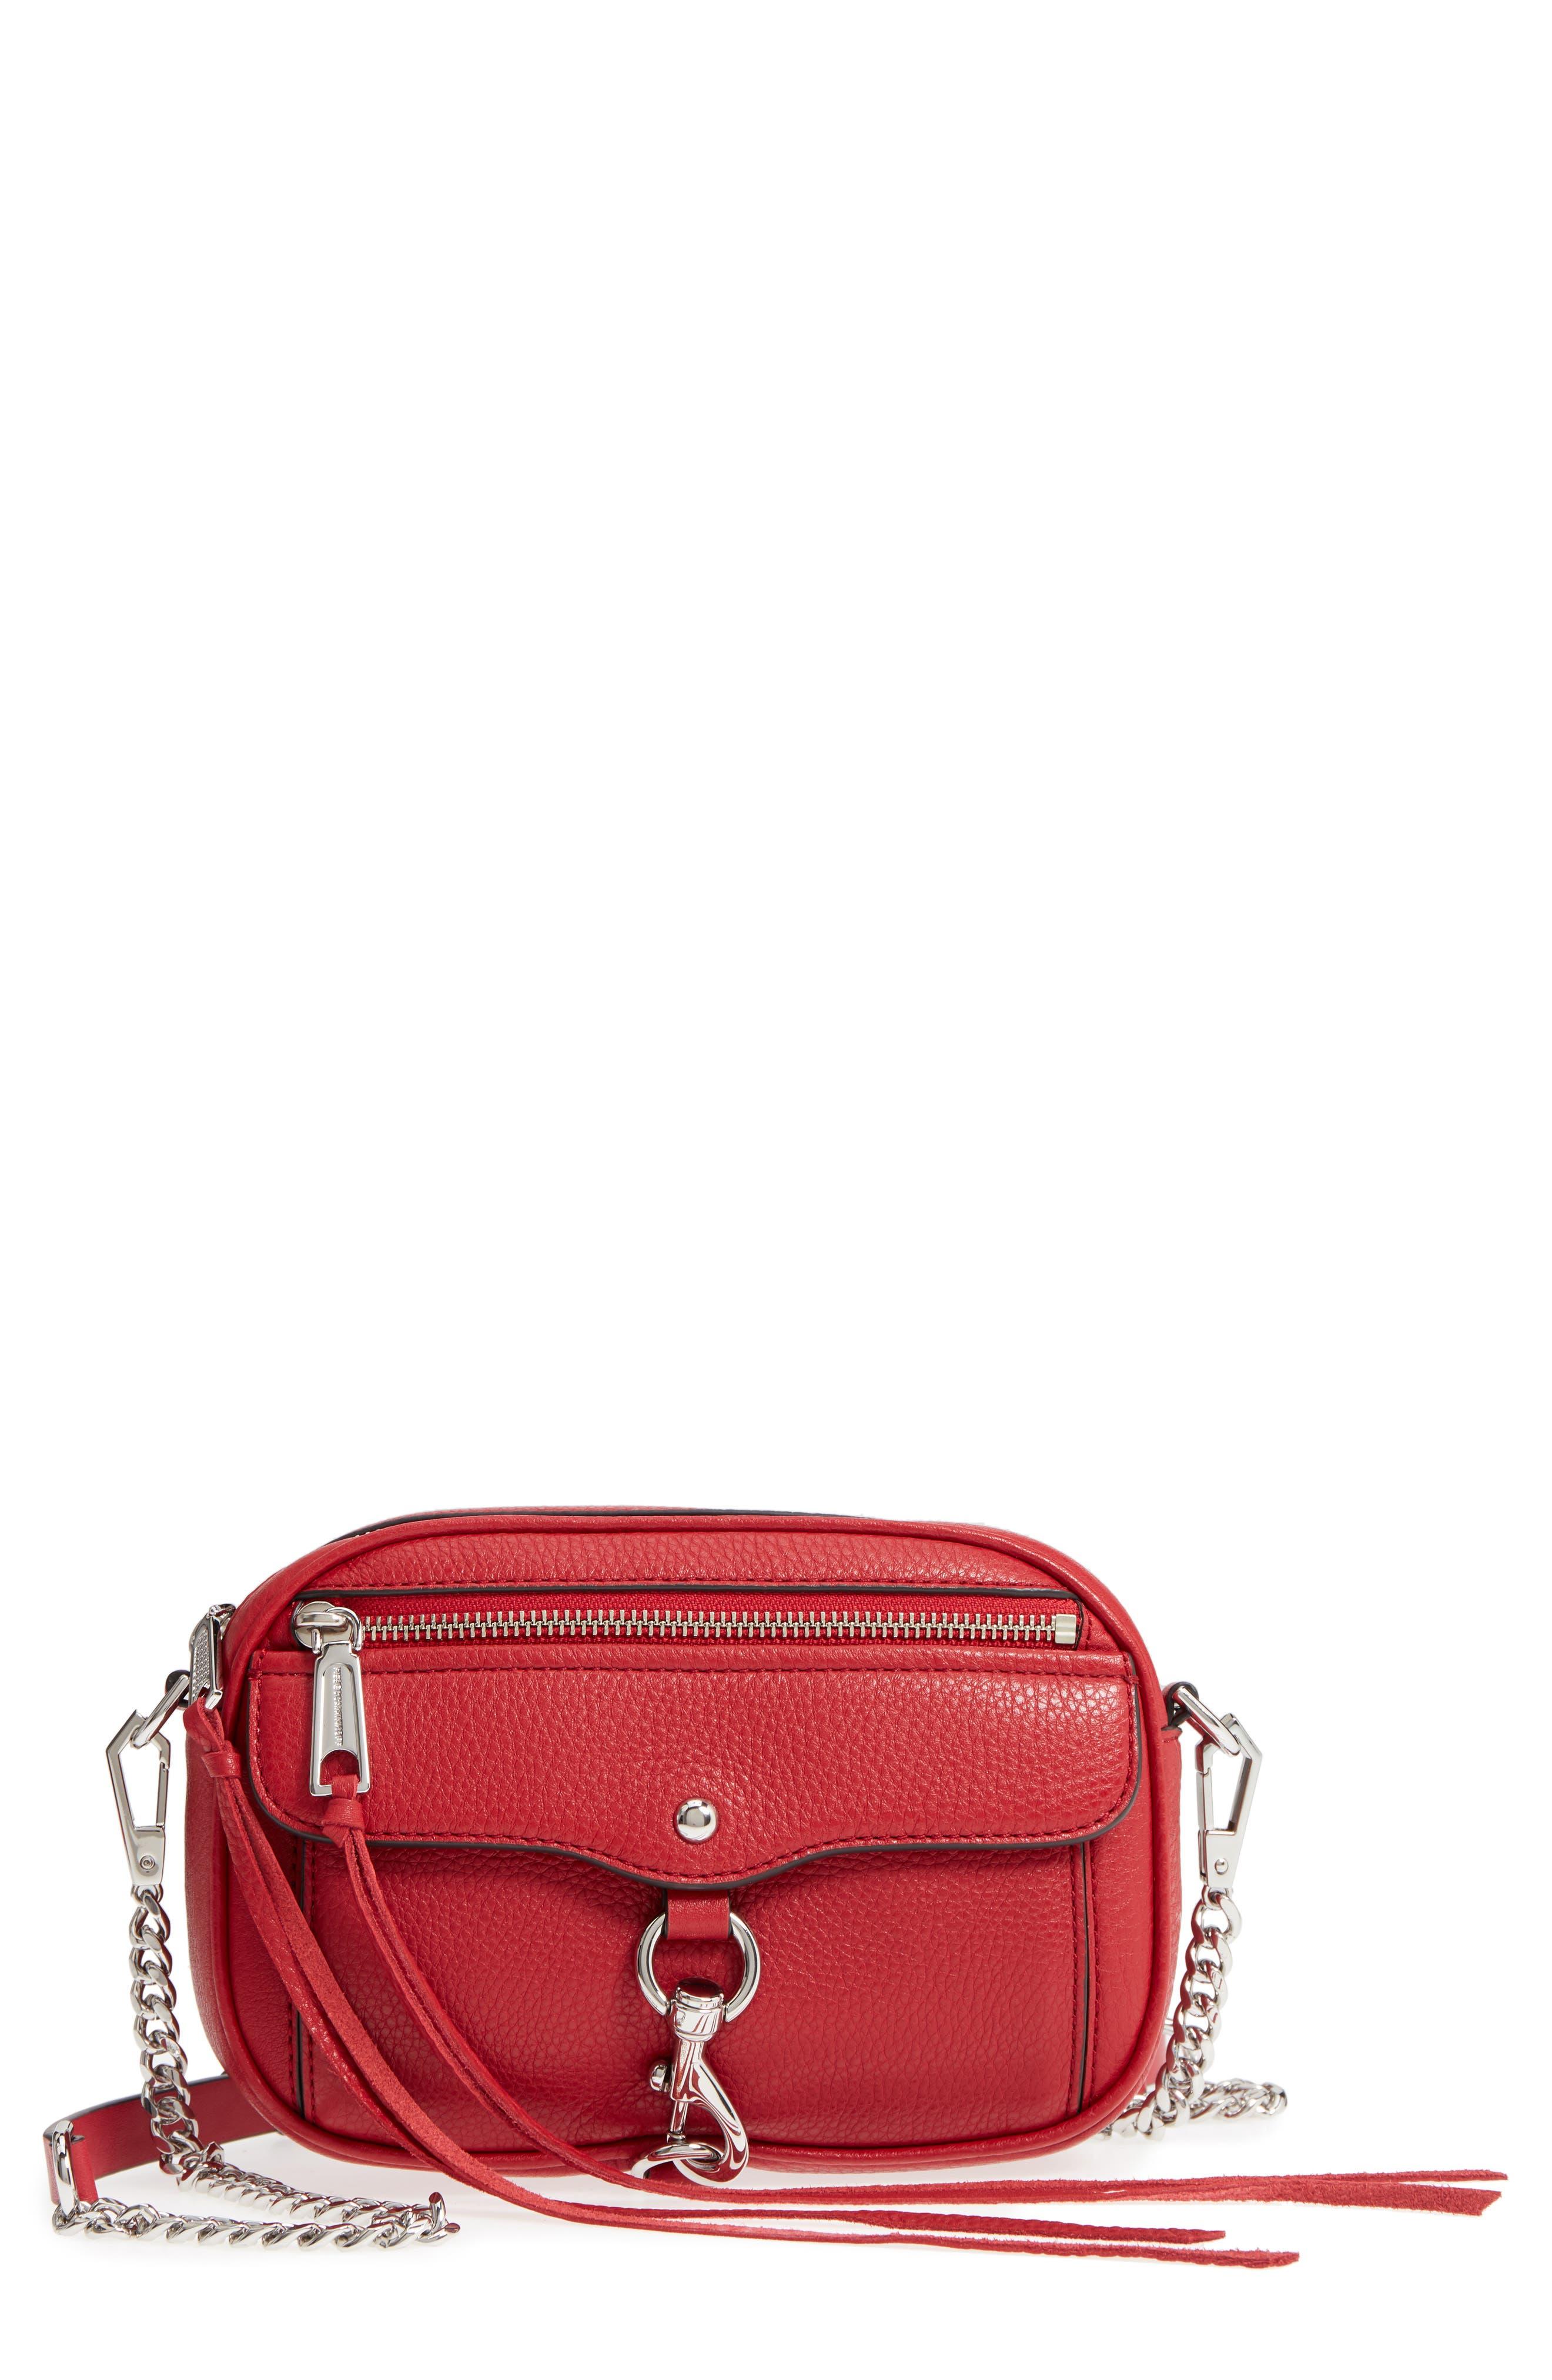 Blythe Leather Crossbody Bag,                         Main,                         color, Scarlet